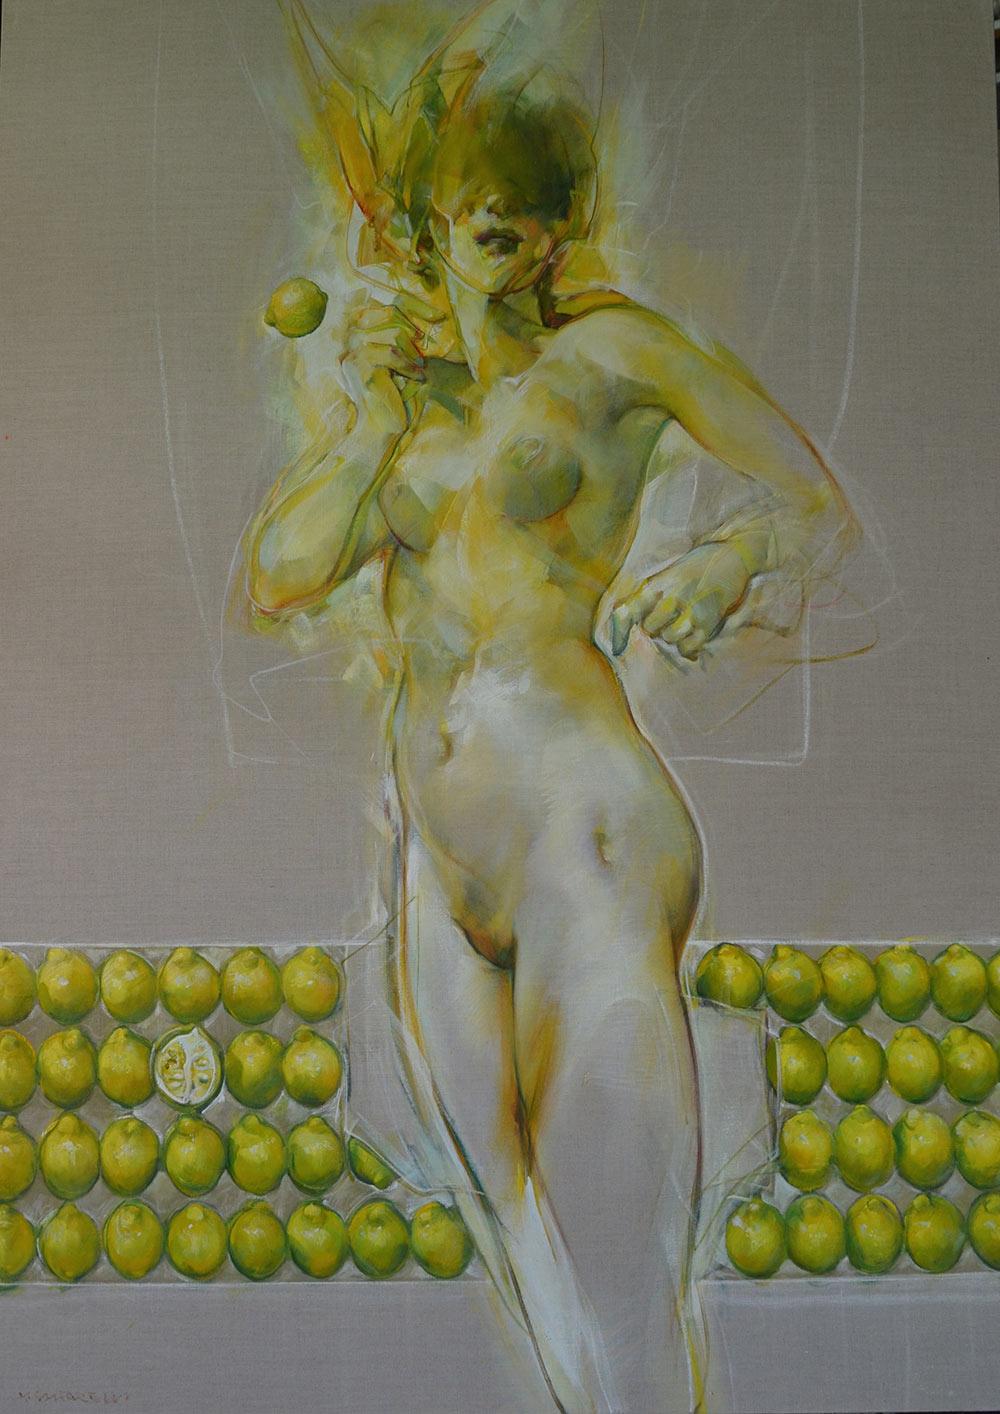 Vanni Saltarelli, Shampo al limone